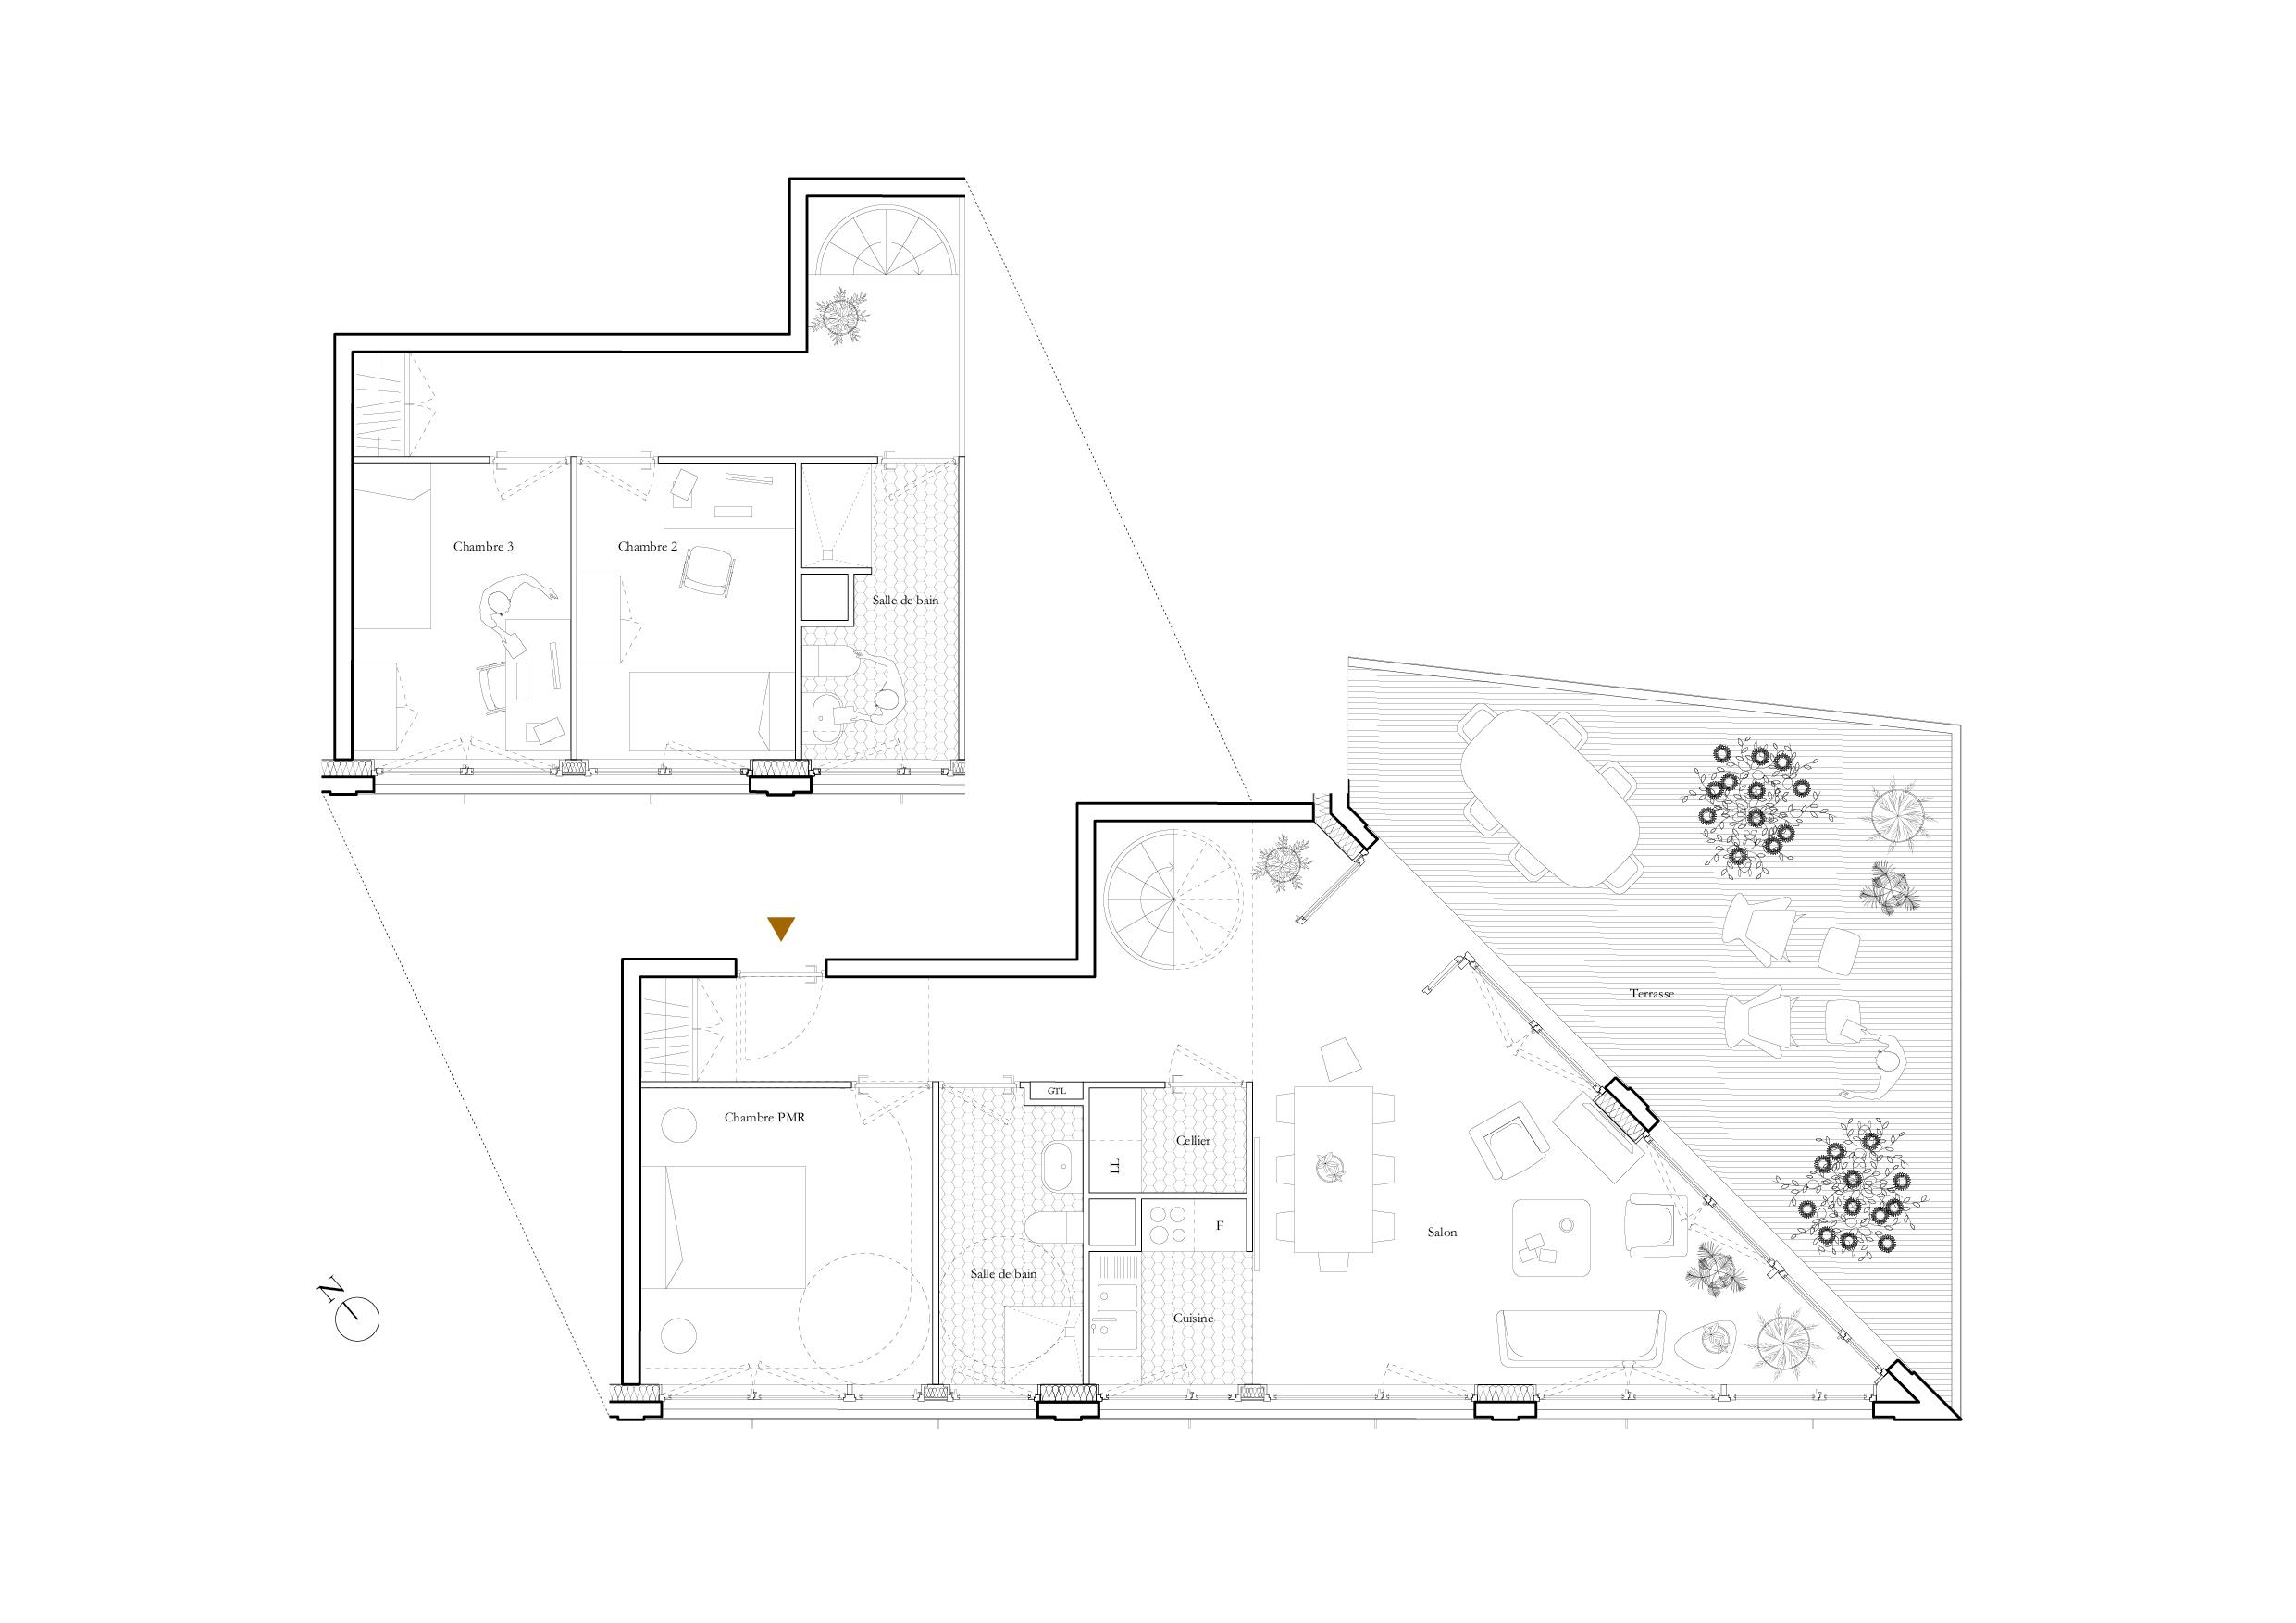 Salle De Bain Pmr Plan ~ plan maison t2 gallery of plan de maison with plan maison t2